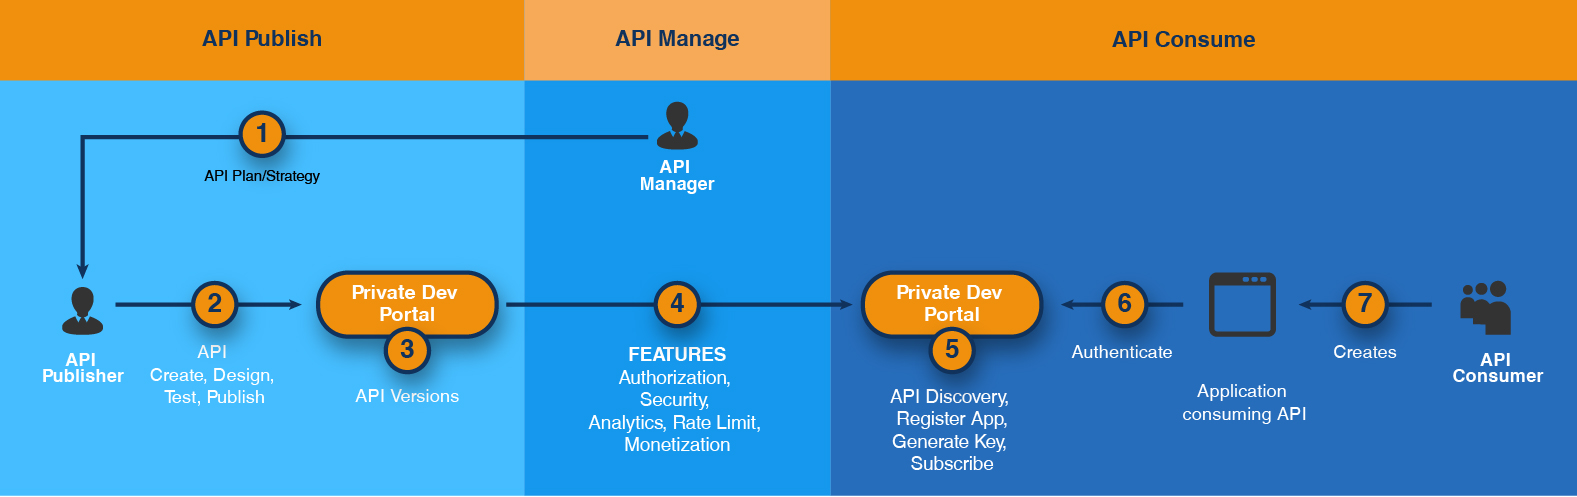 FIG-2:  API life-cycle and personas